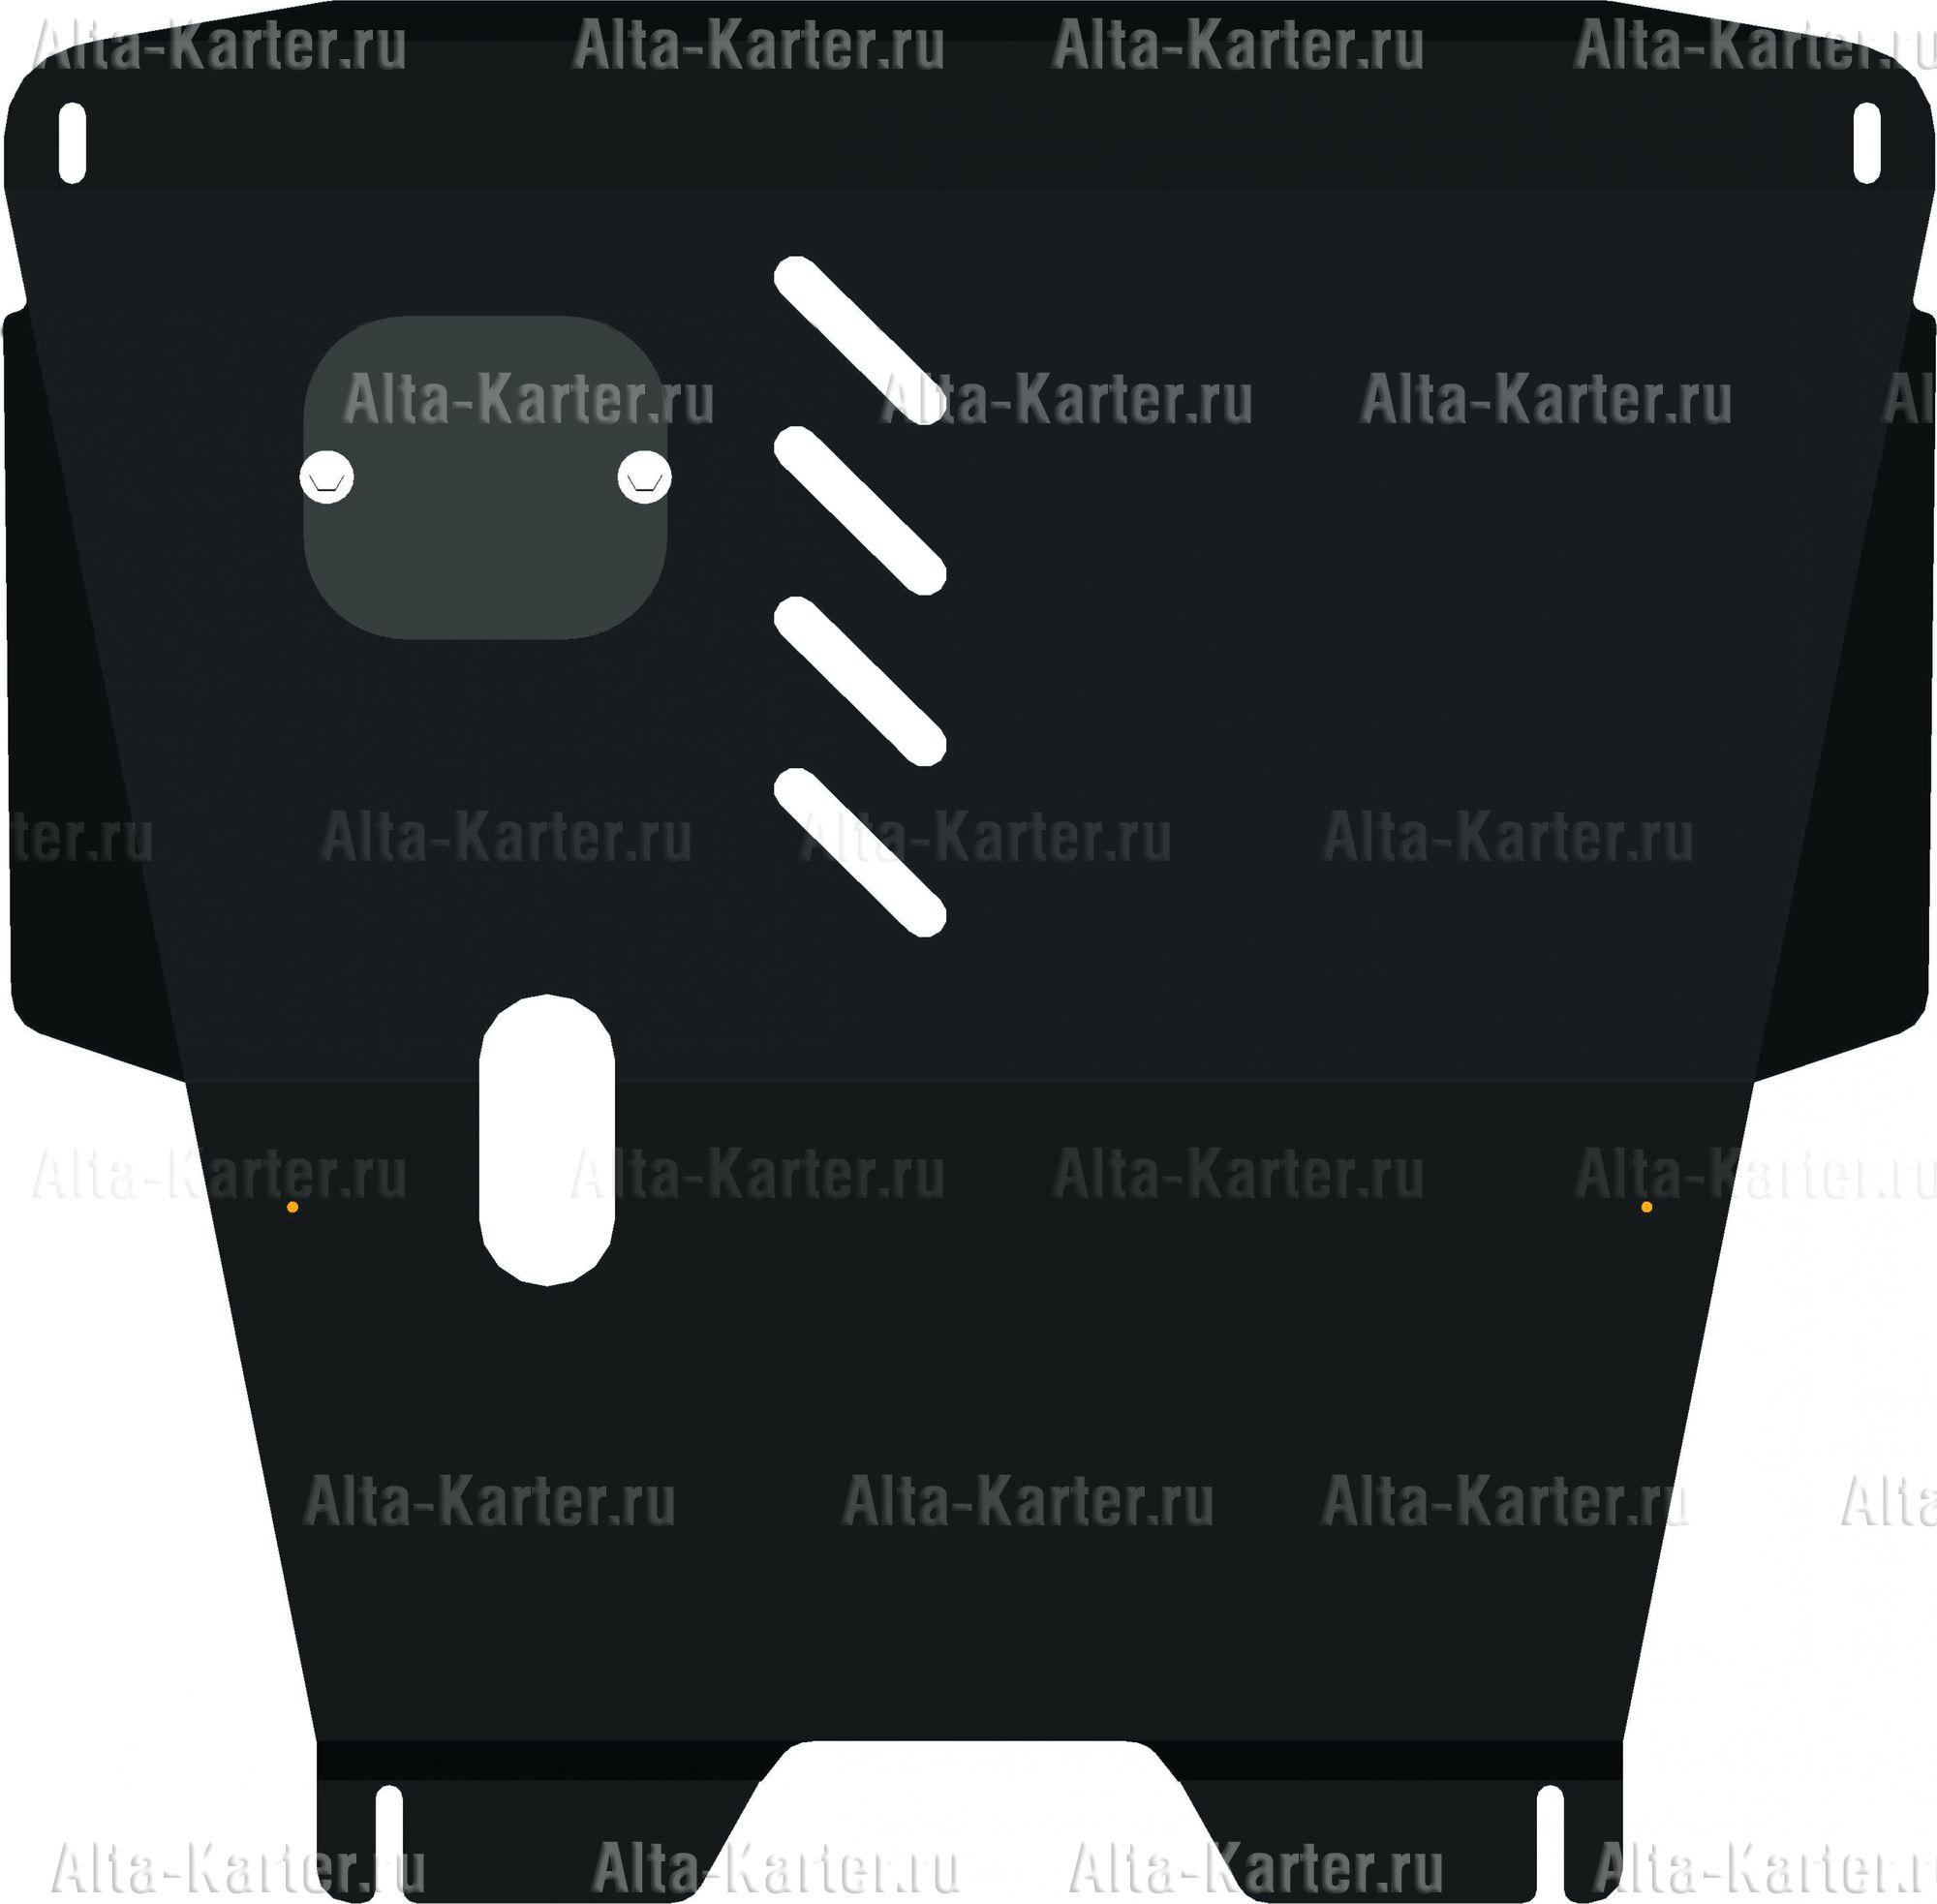 Защита Alfeco для картера и КПП Toyota Echo 2000-2005. Артикул ALF.24.44